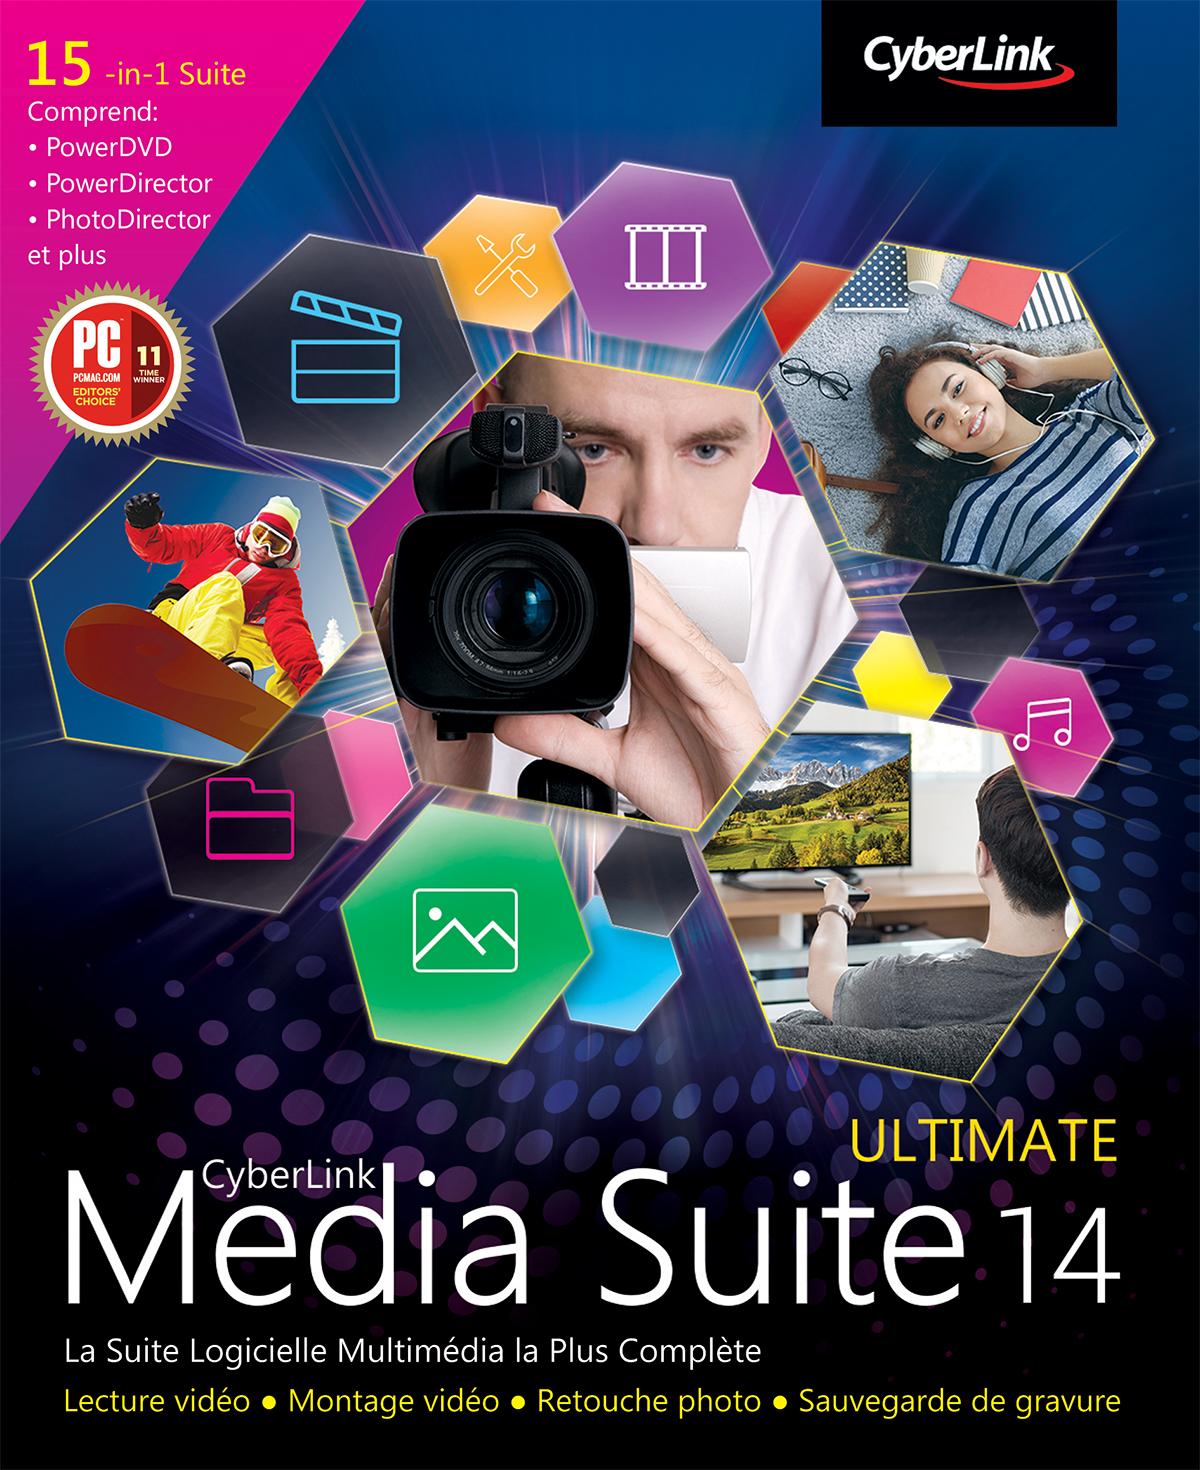 CyberLink Media Suite 14 Ultimate [Téléchargement]